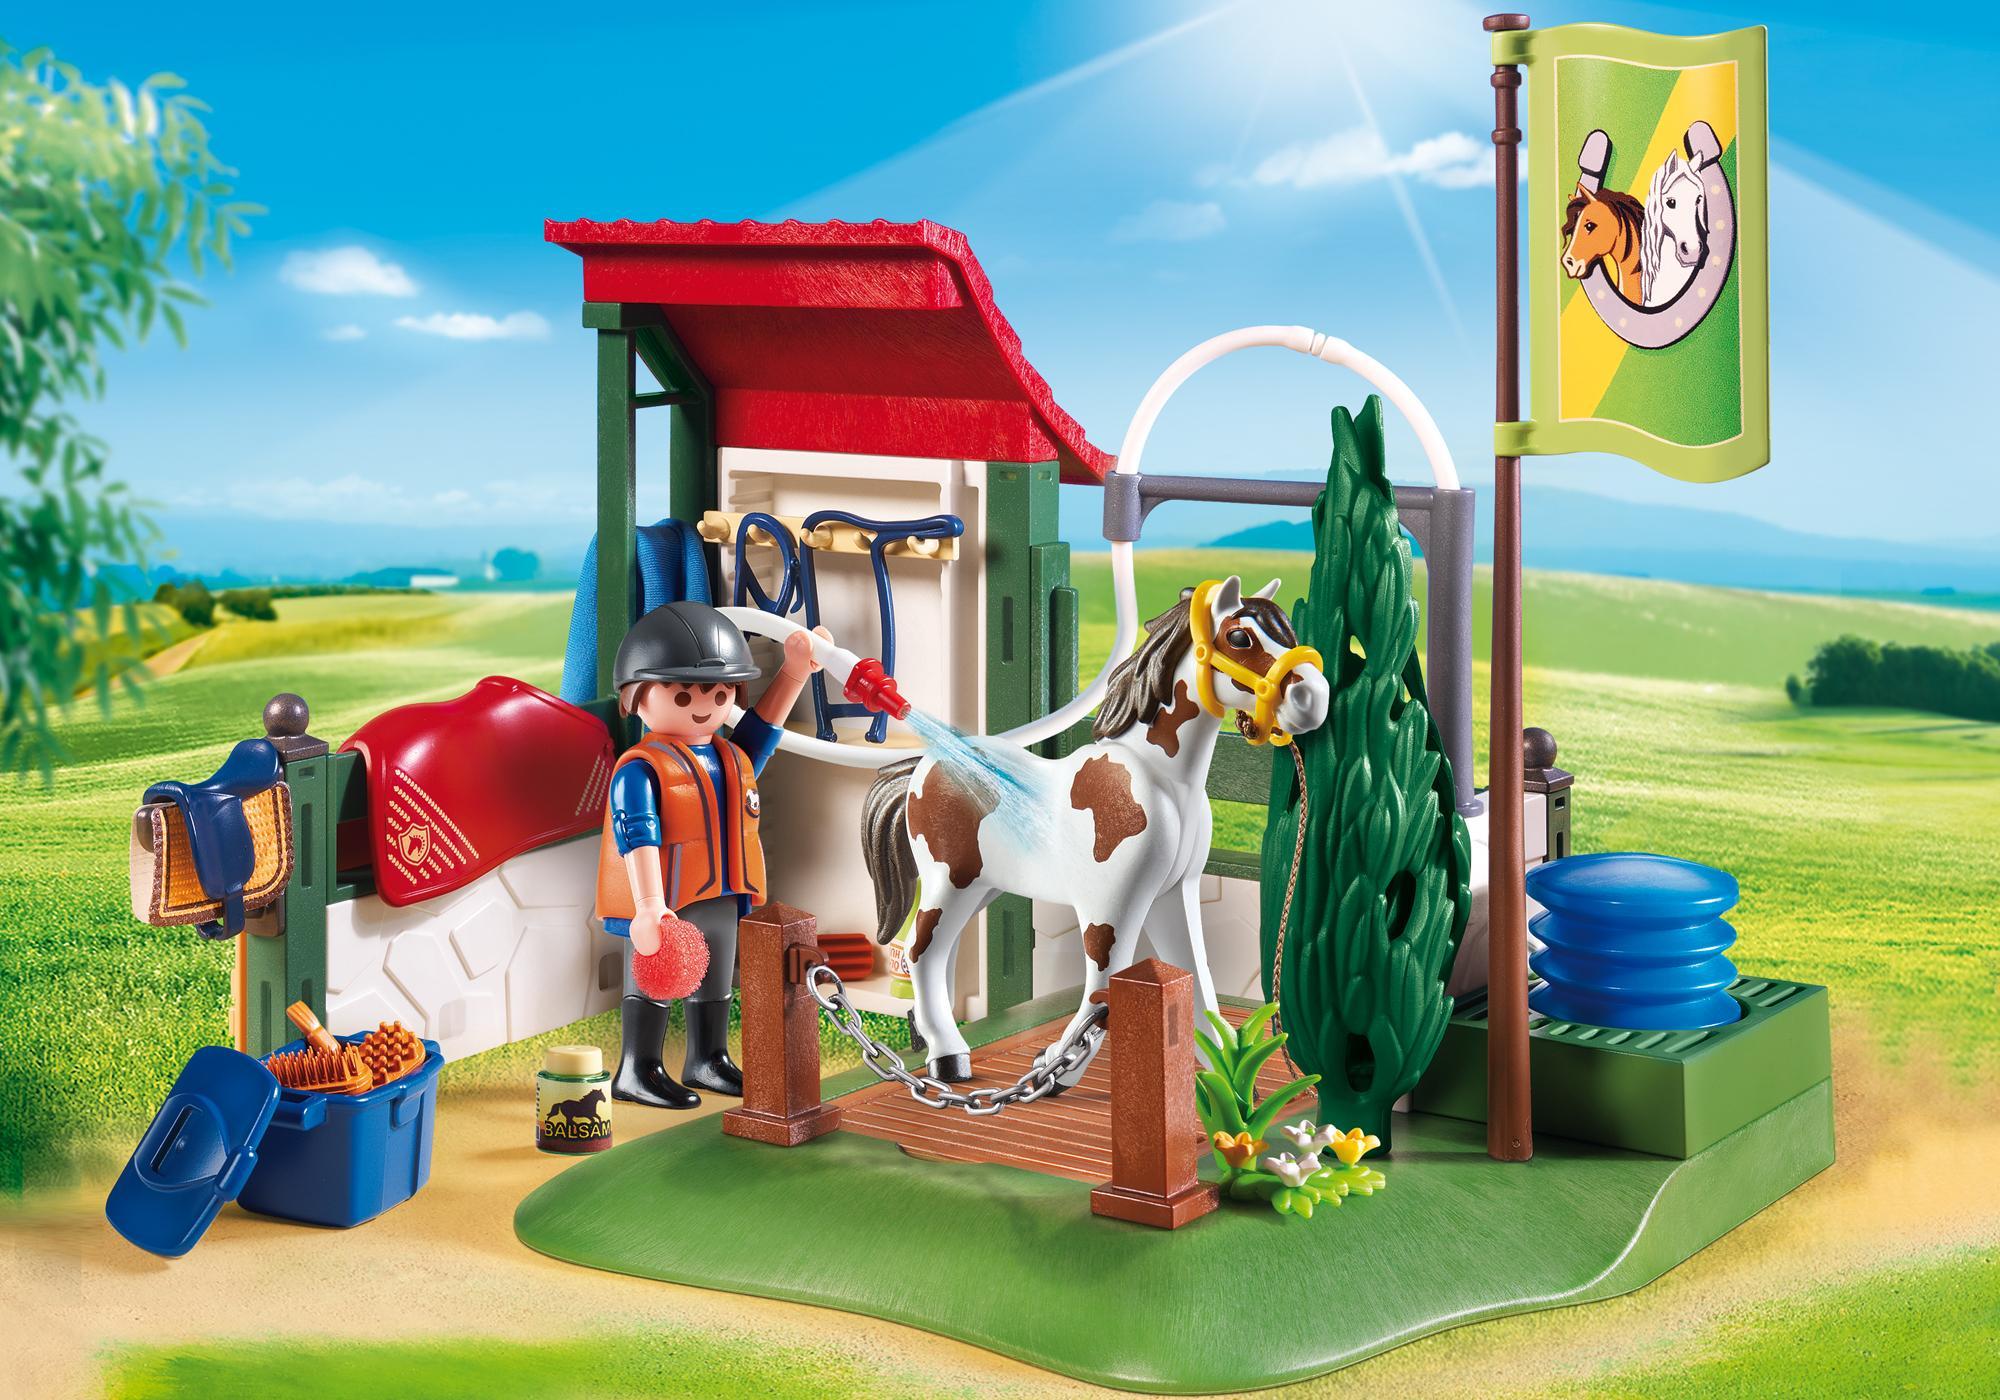 http://media.playmobil.com/i/playmobil/6929_product_detail/Pferdewaschplatz